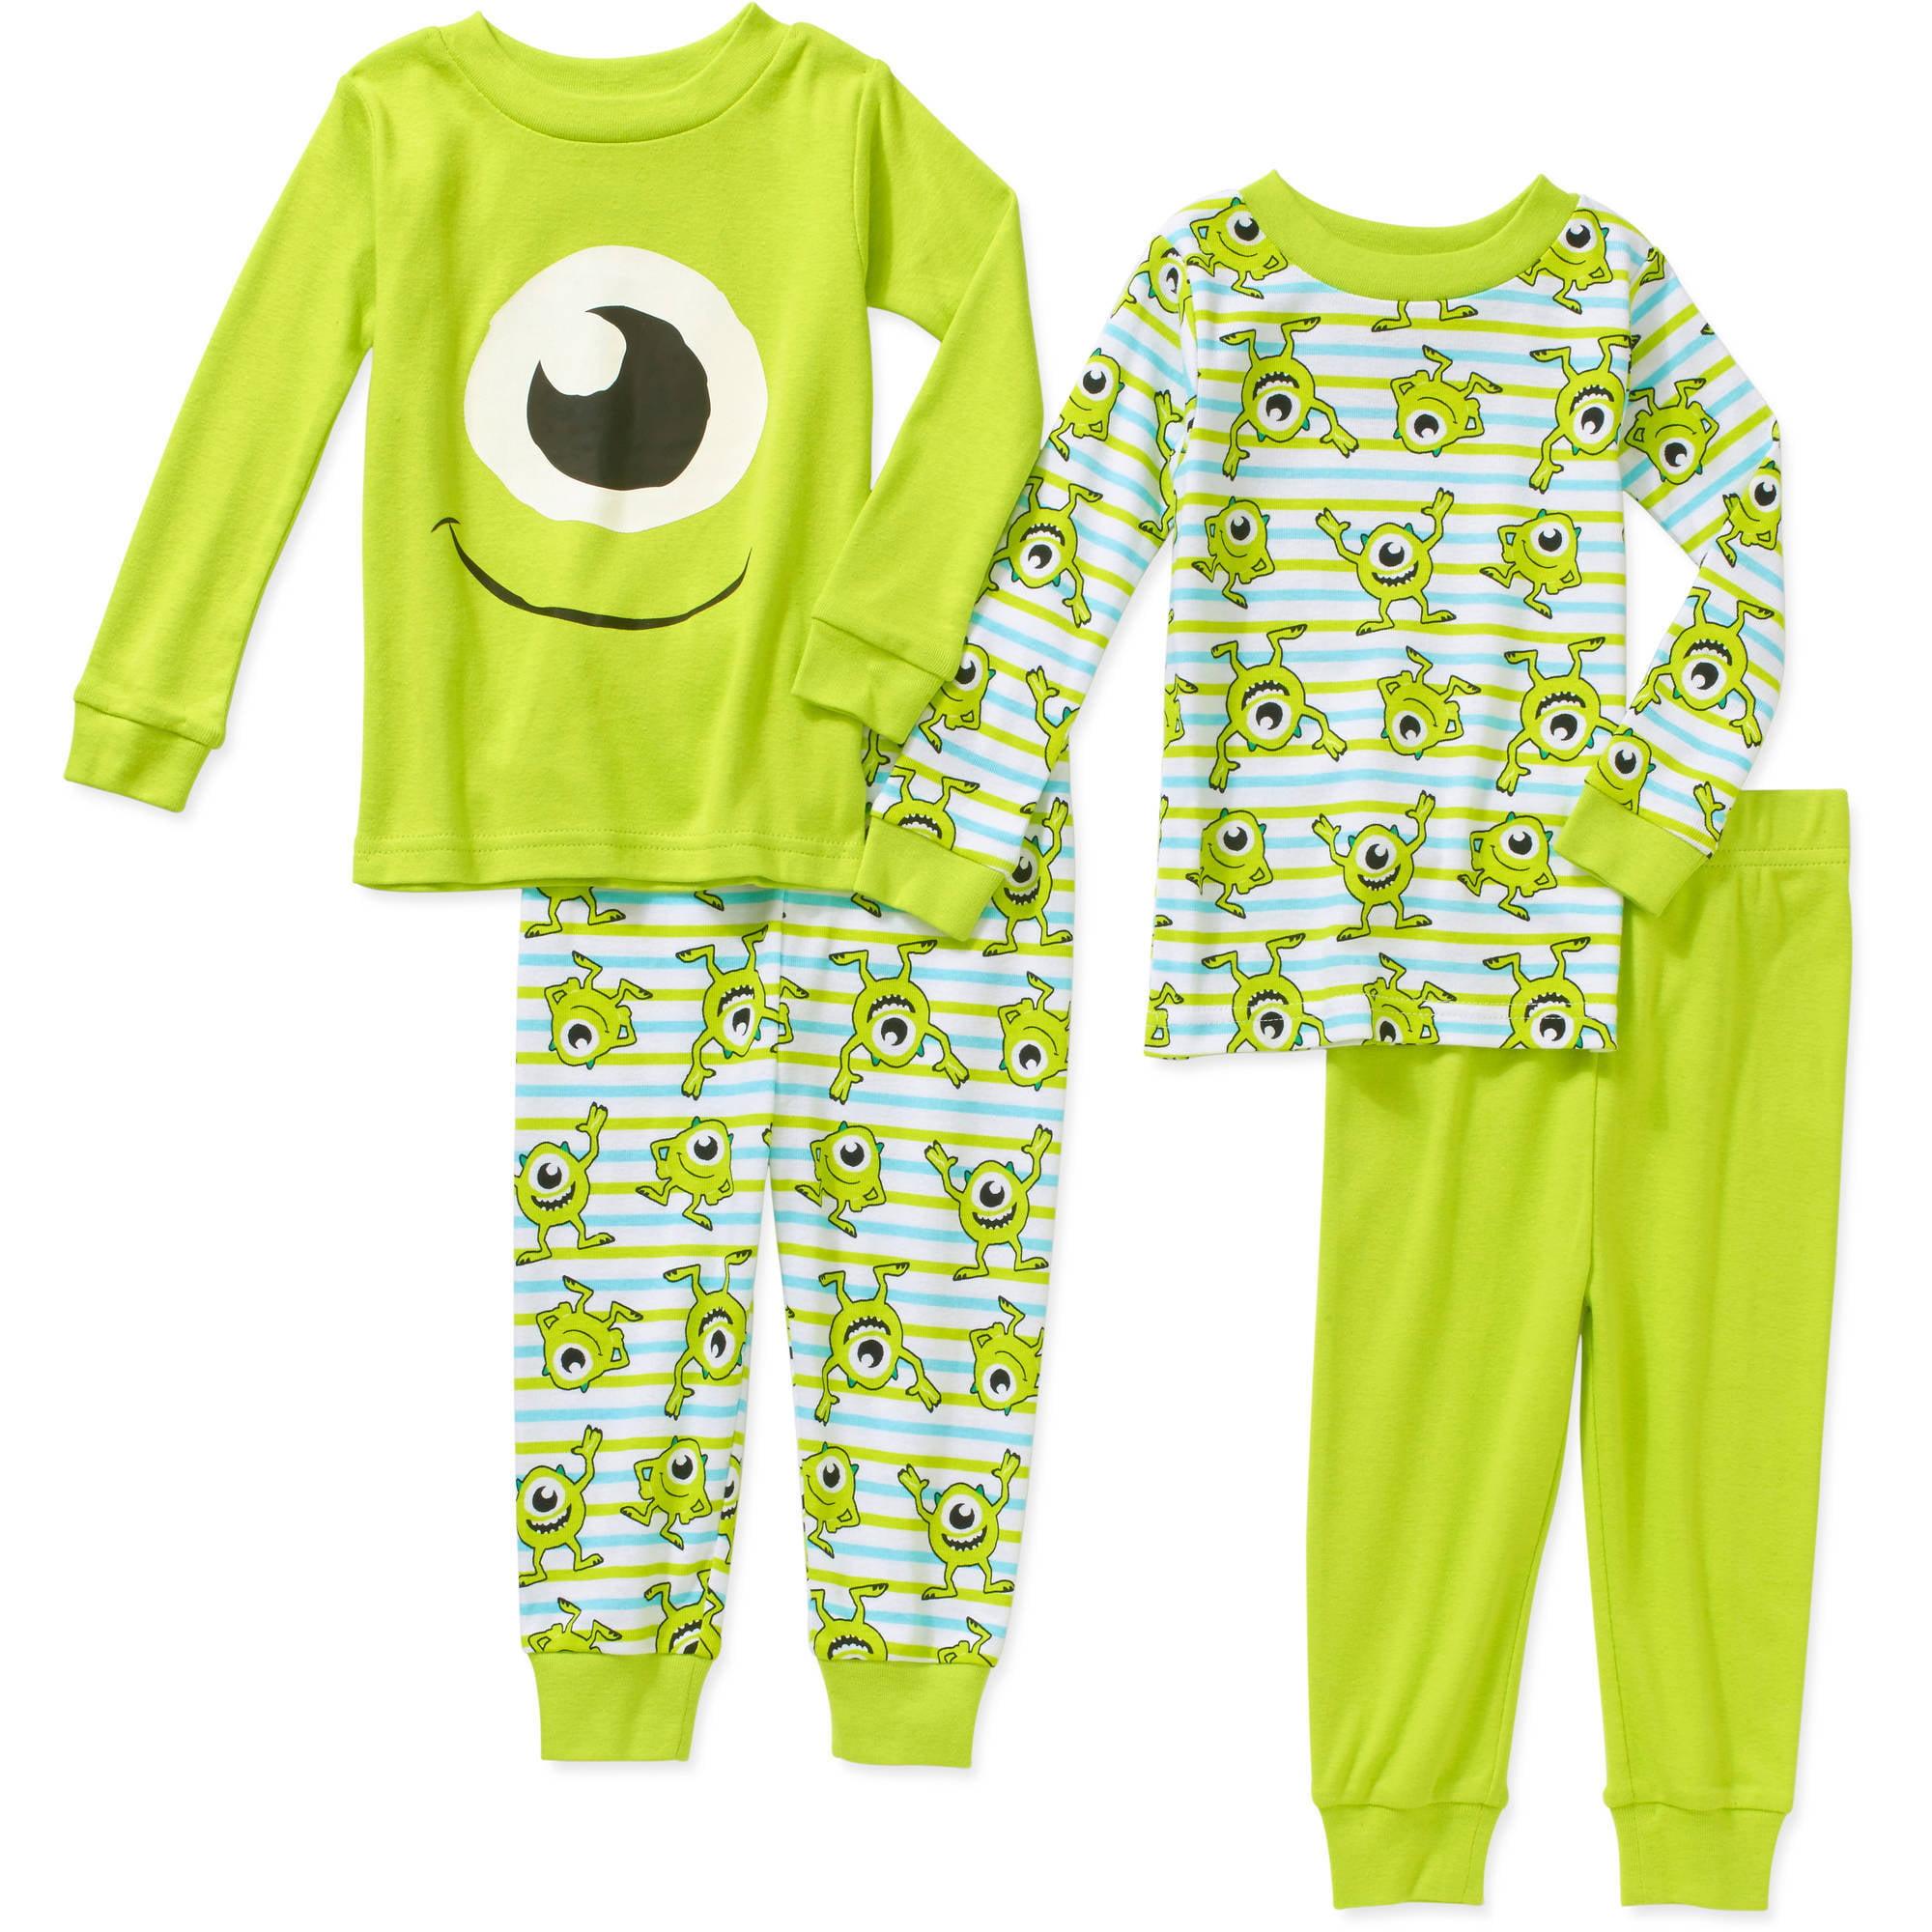 Monsters Inc. Newborn Baby Boy Cotton Tight Fit Pajamas 4pc Set